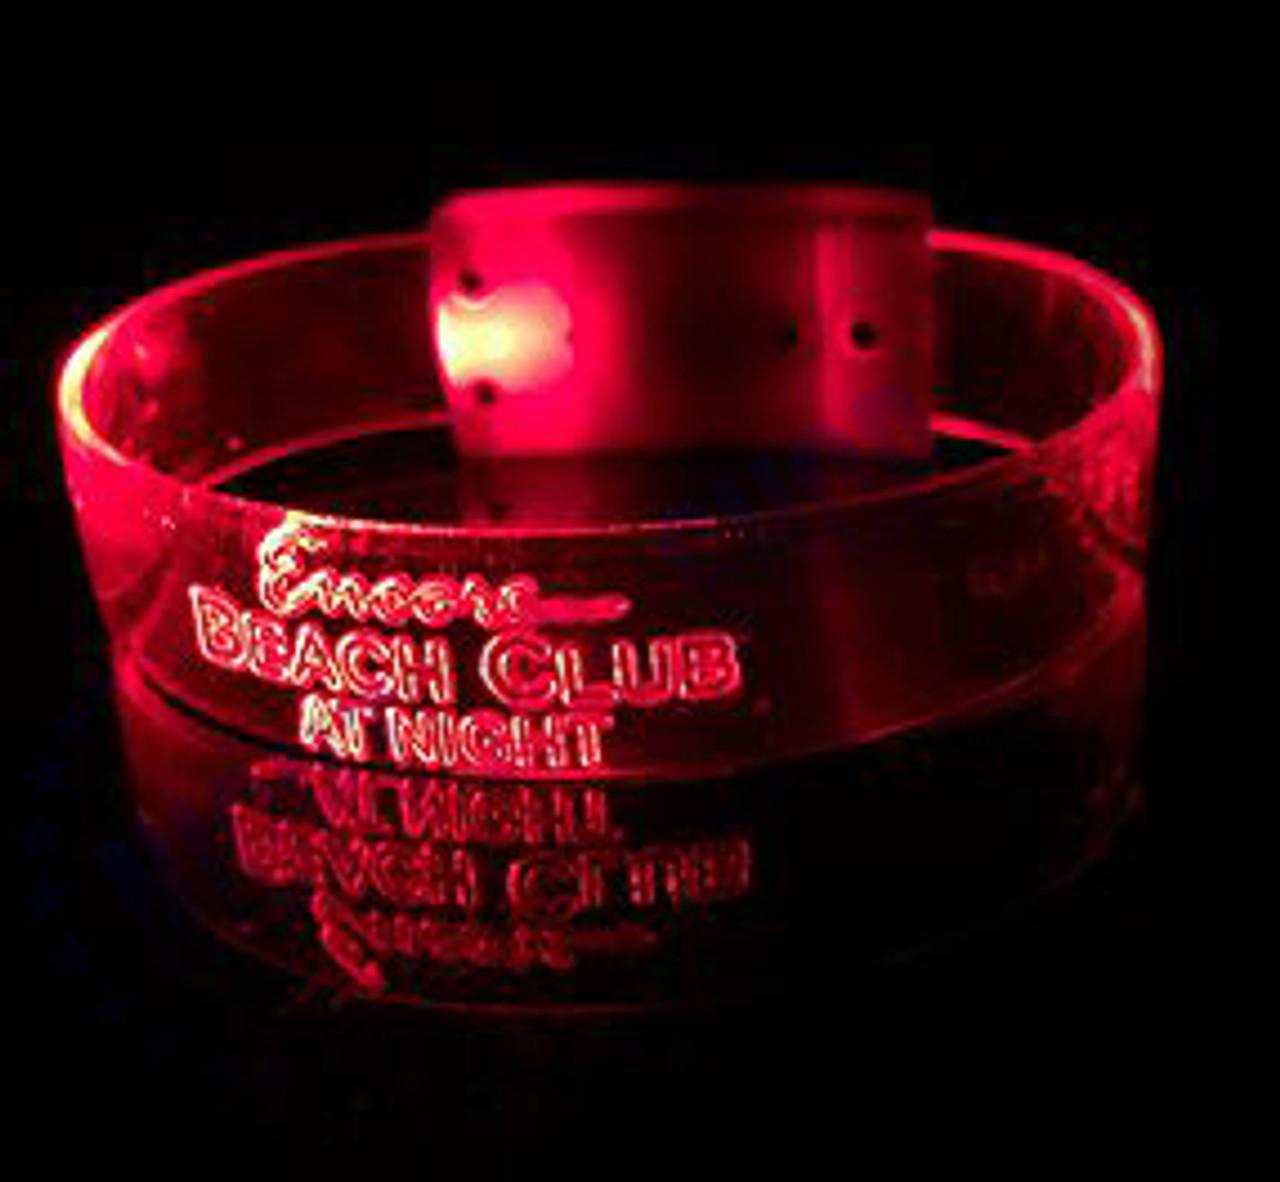 Sound,reactive,activated, custom, LED, Wristband,bracelet, sports,charity,school, nightclub, VIP, fundraiser, sound activated, music,flashing,LED wristband,Encore,Nightclub,Las Vegas